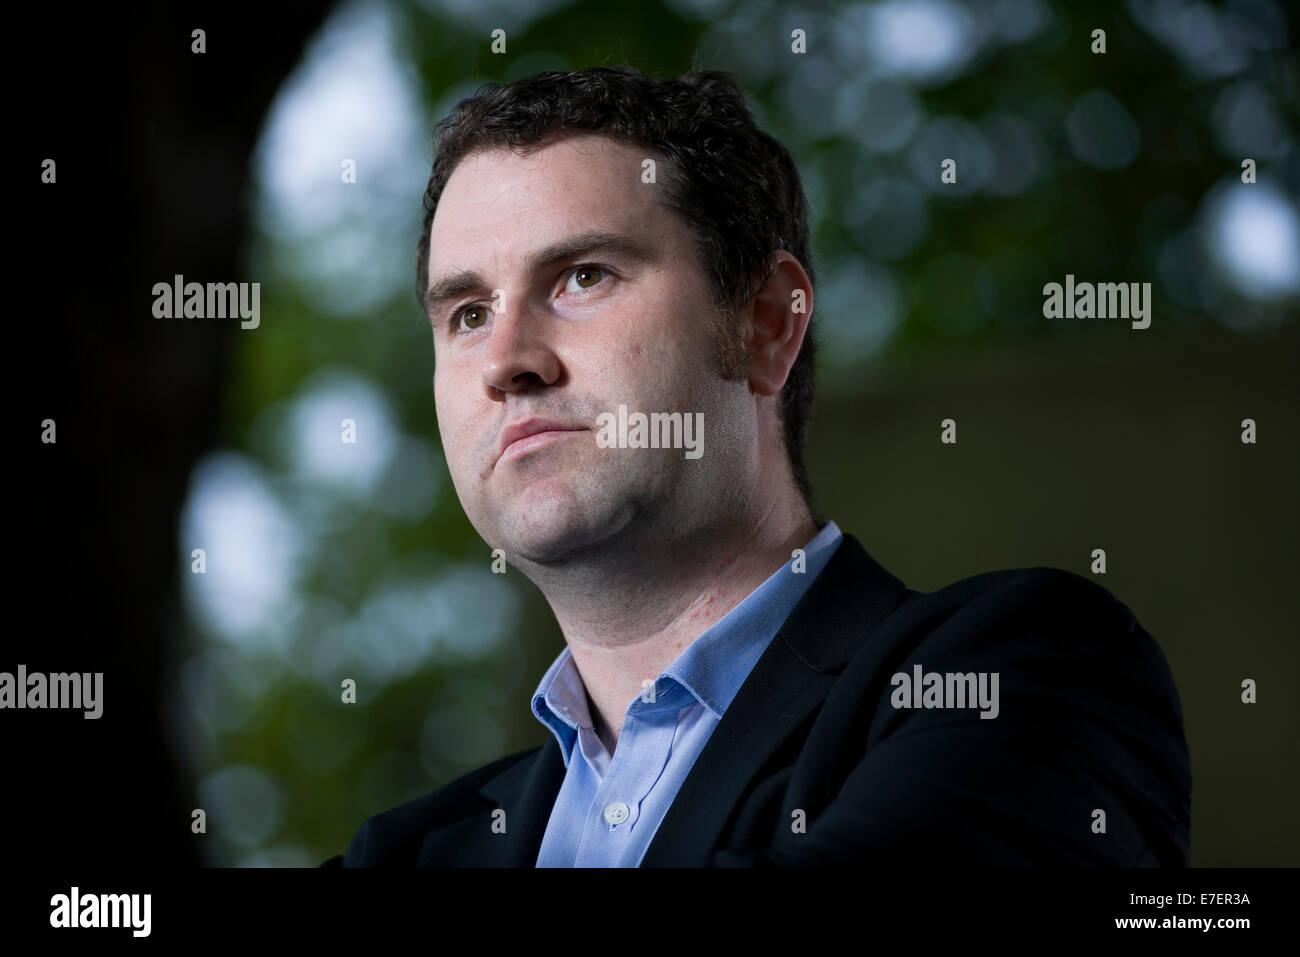 Author Mason Cross appears at the Edinburgh International Book Festival. - Stock Image